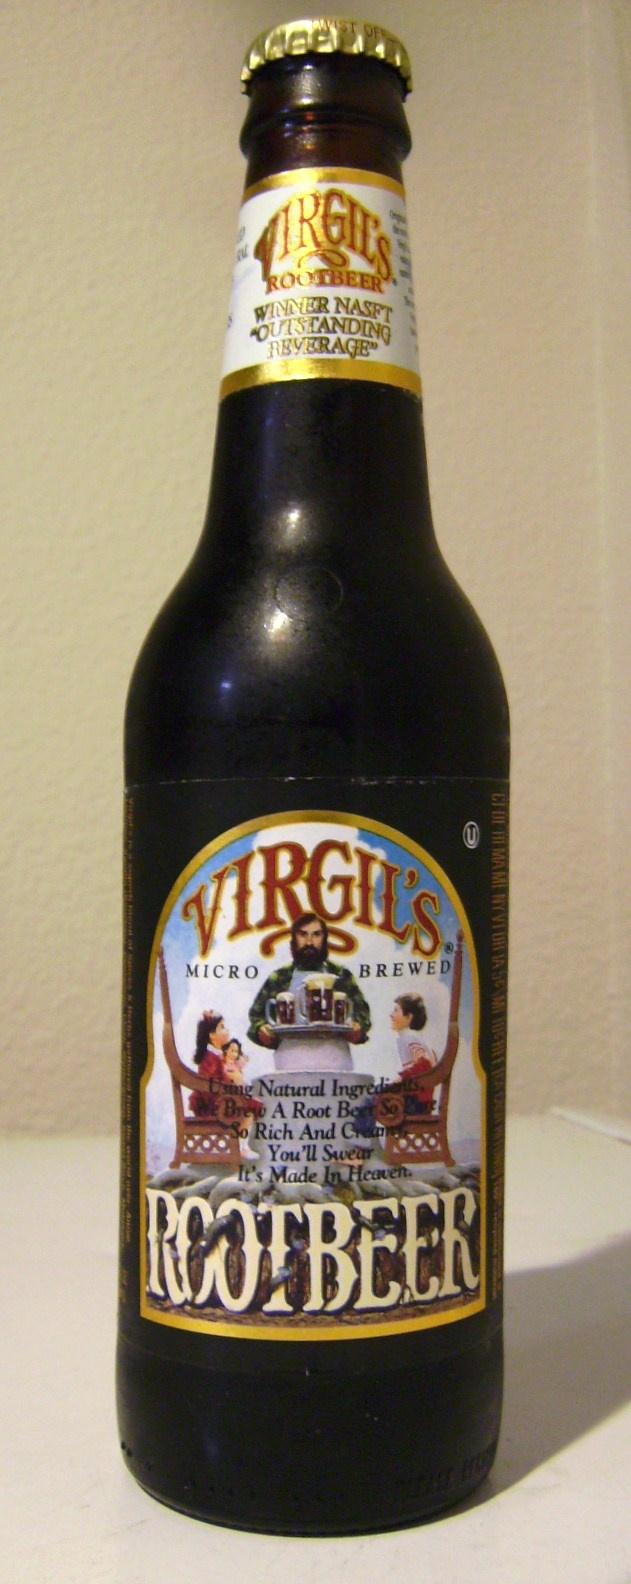 The best root beer made by humans.  #rootbeer #virgils